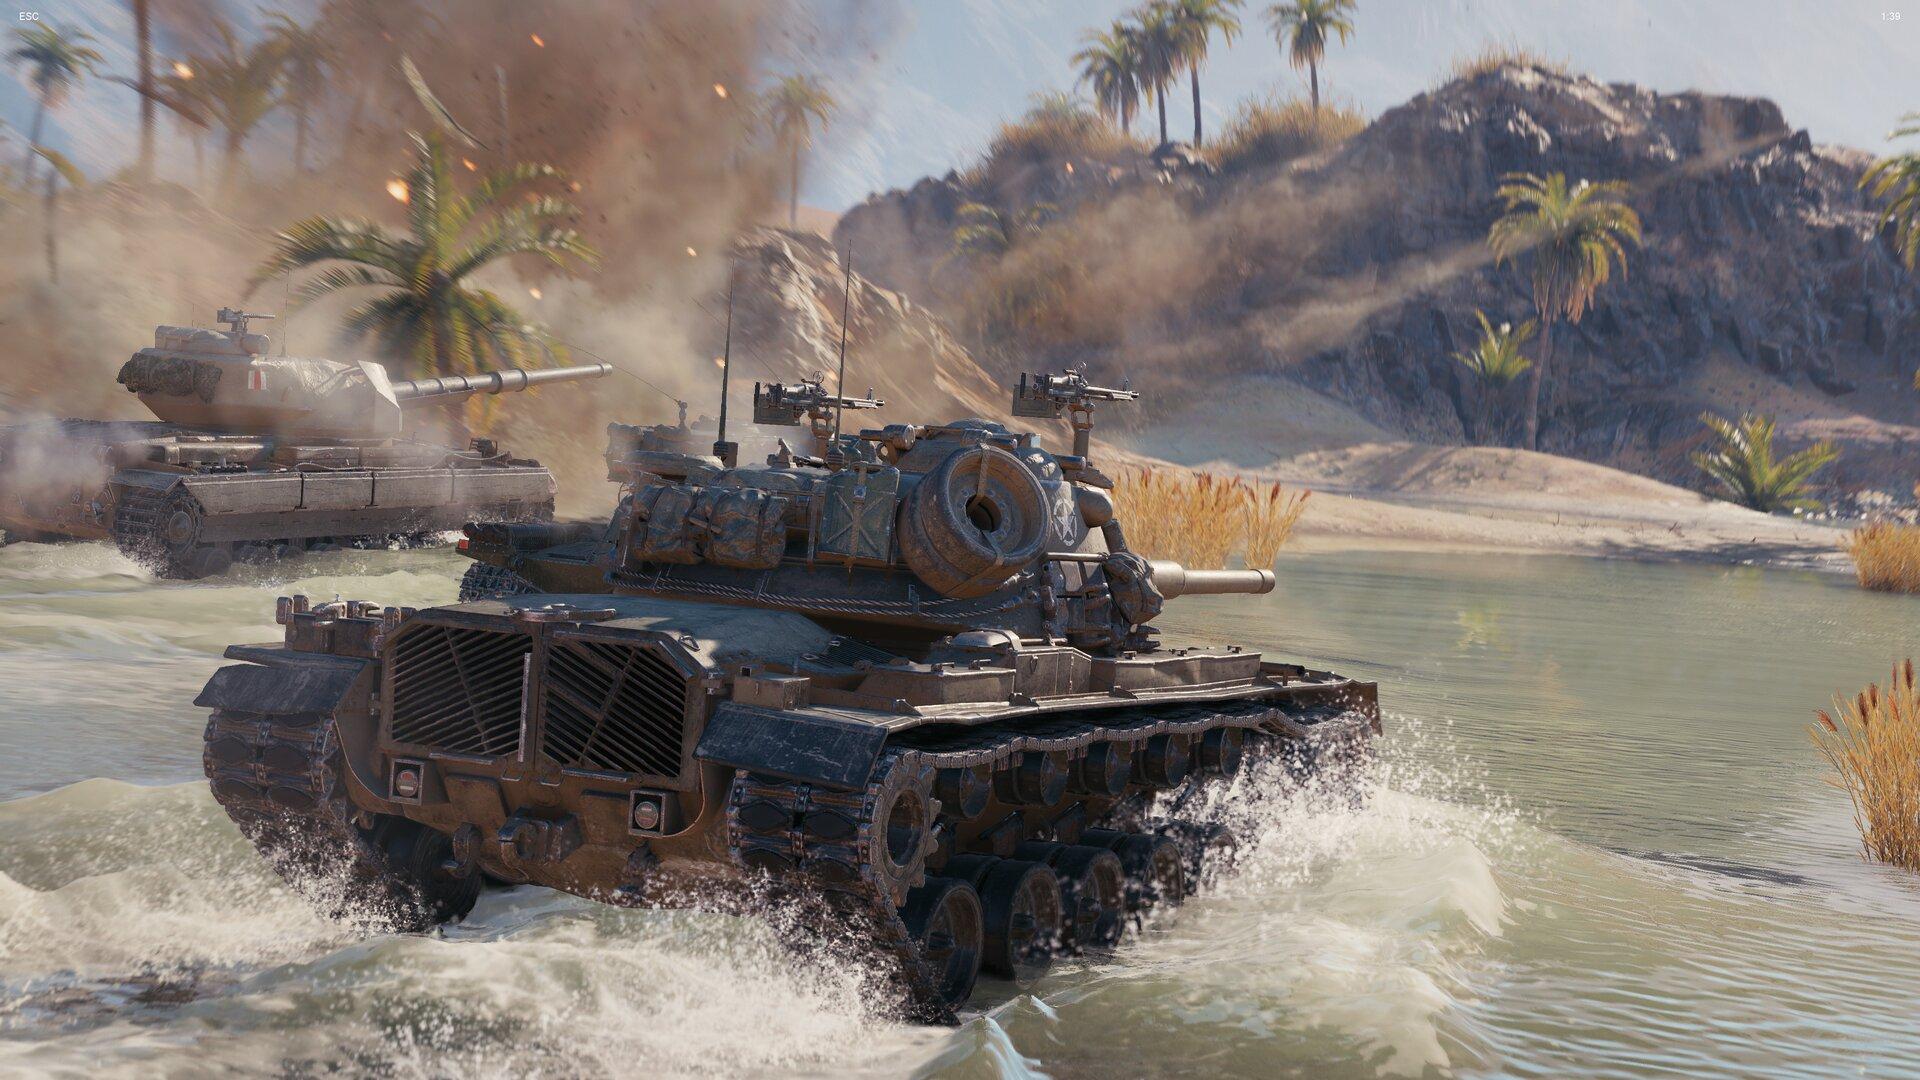 World of Tanks enCore RT